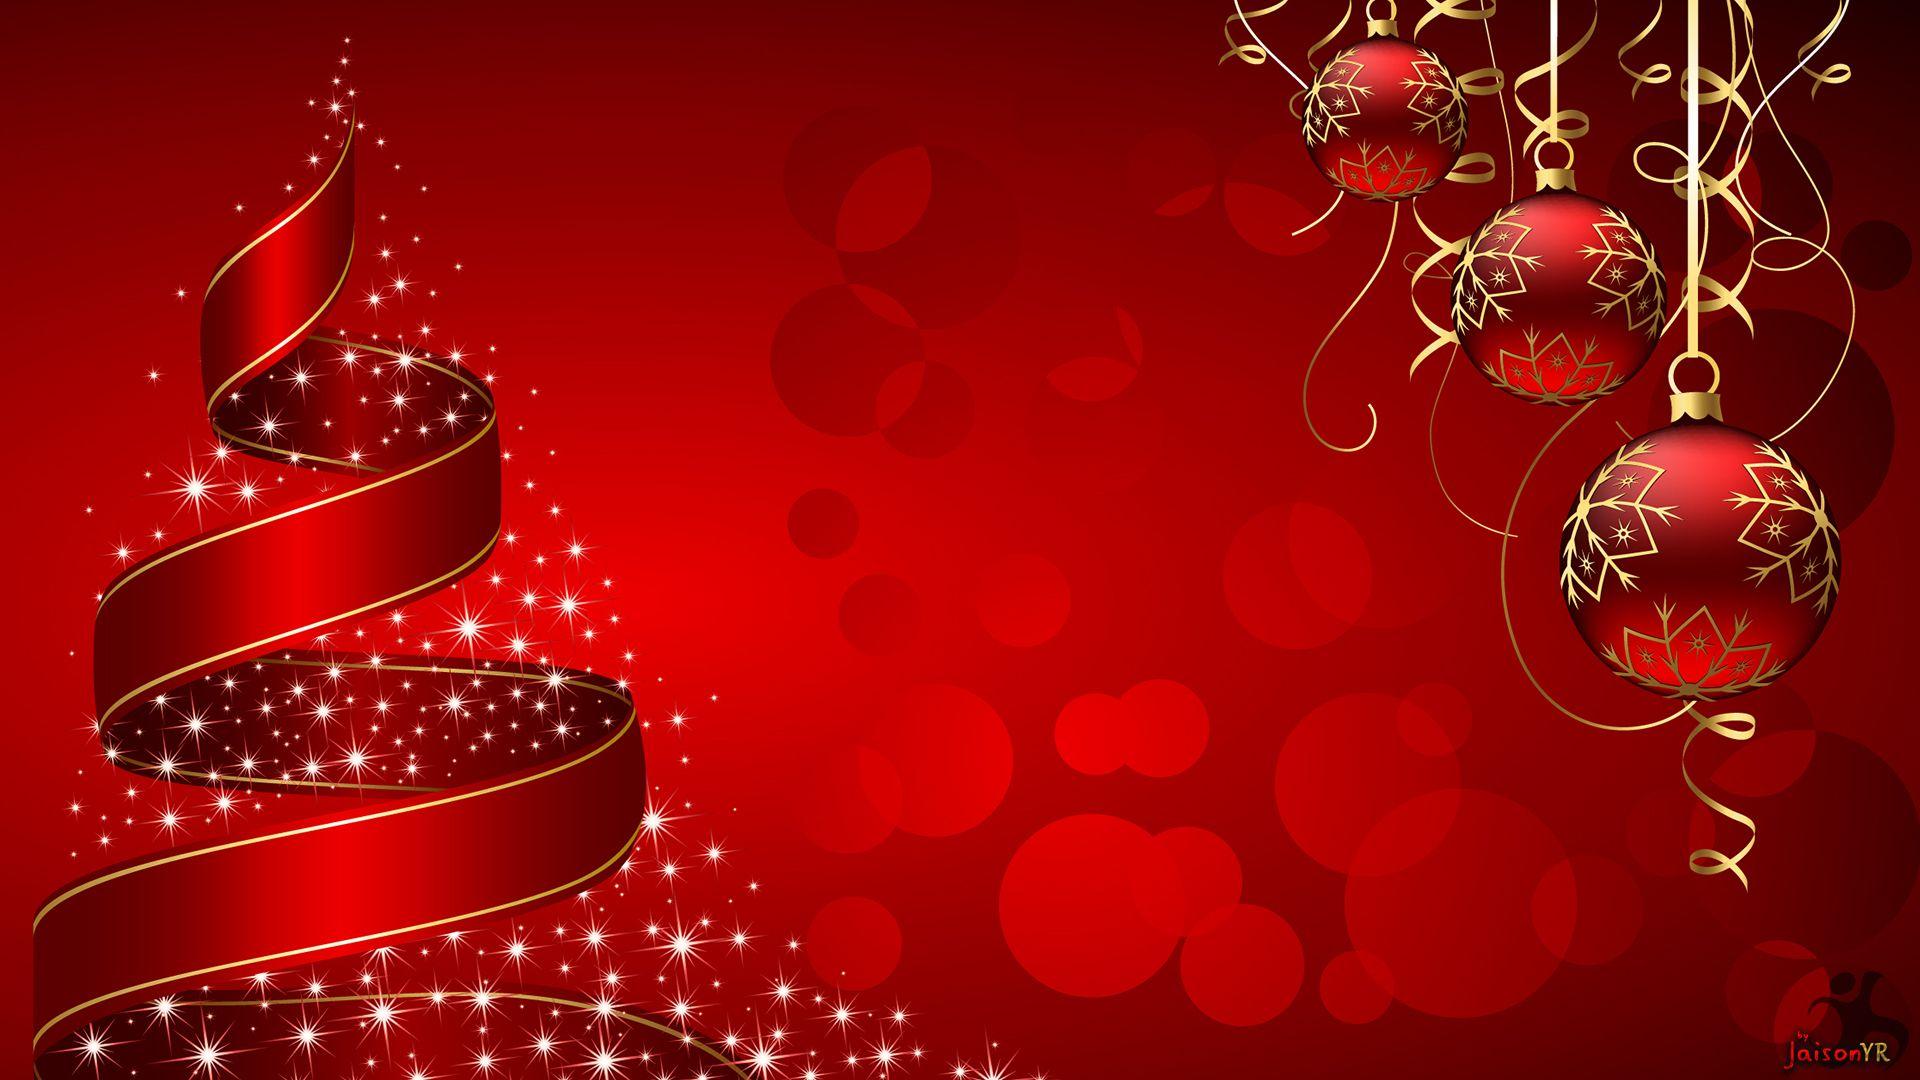 """Christmas 2013"" Blog by Julie Shrader Merry christmas"